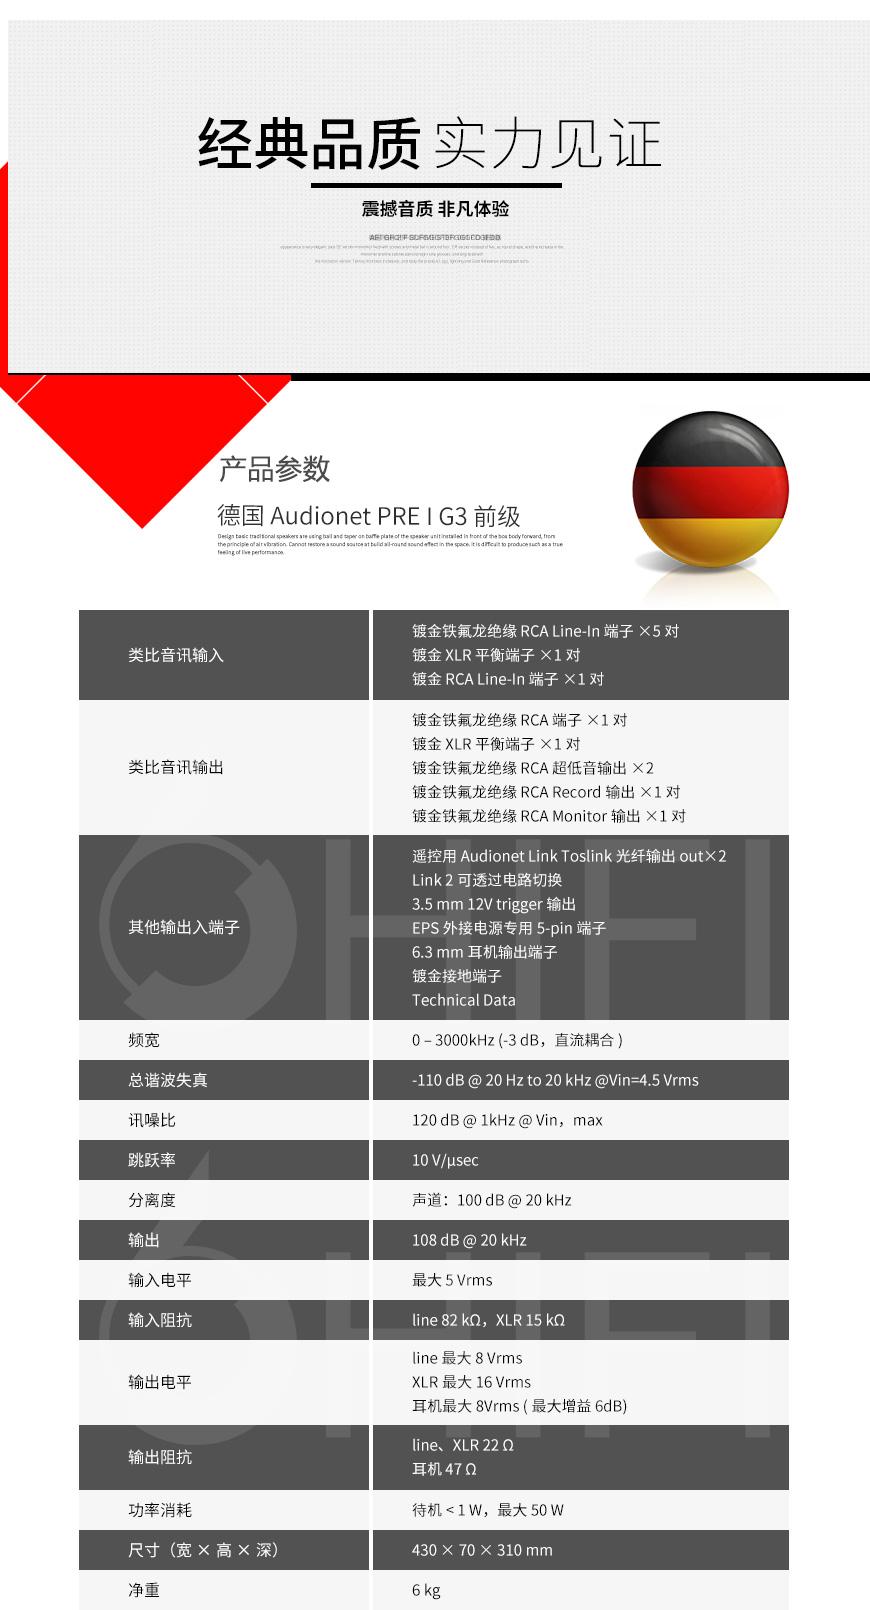 德国 Audionet PRE I G3 前级 25周年,Audionet PRE I G3 前级 25周年,Audionet PRE I G3,德国 Audionet